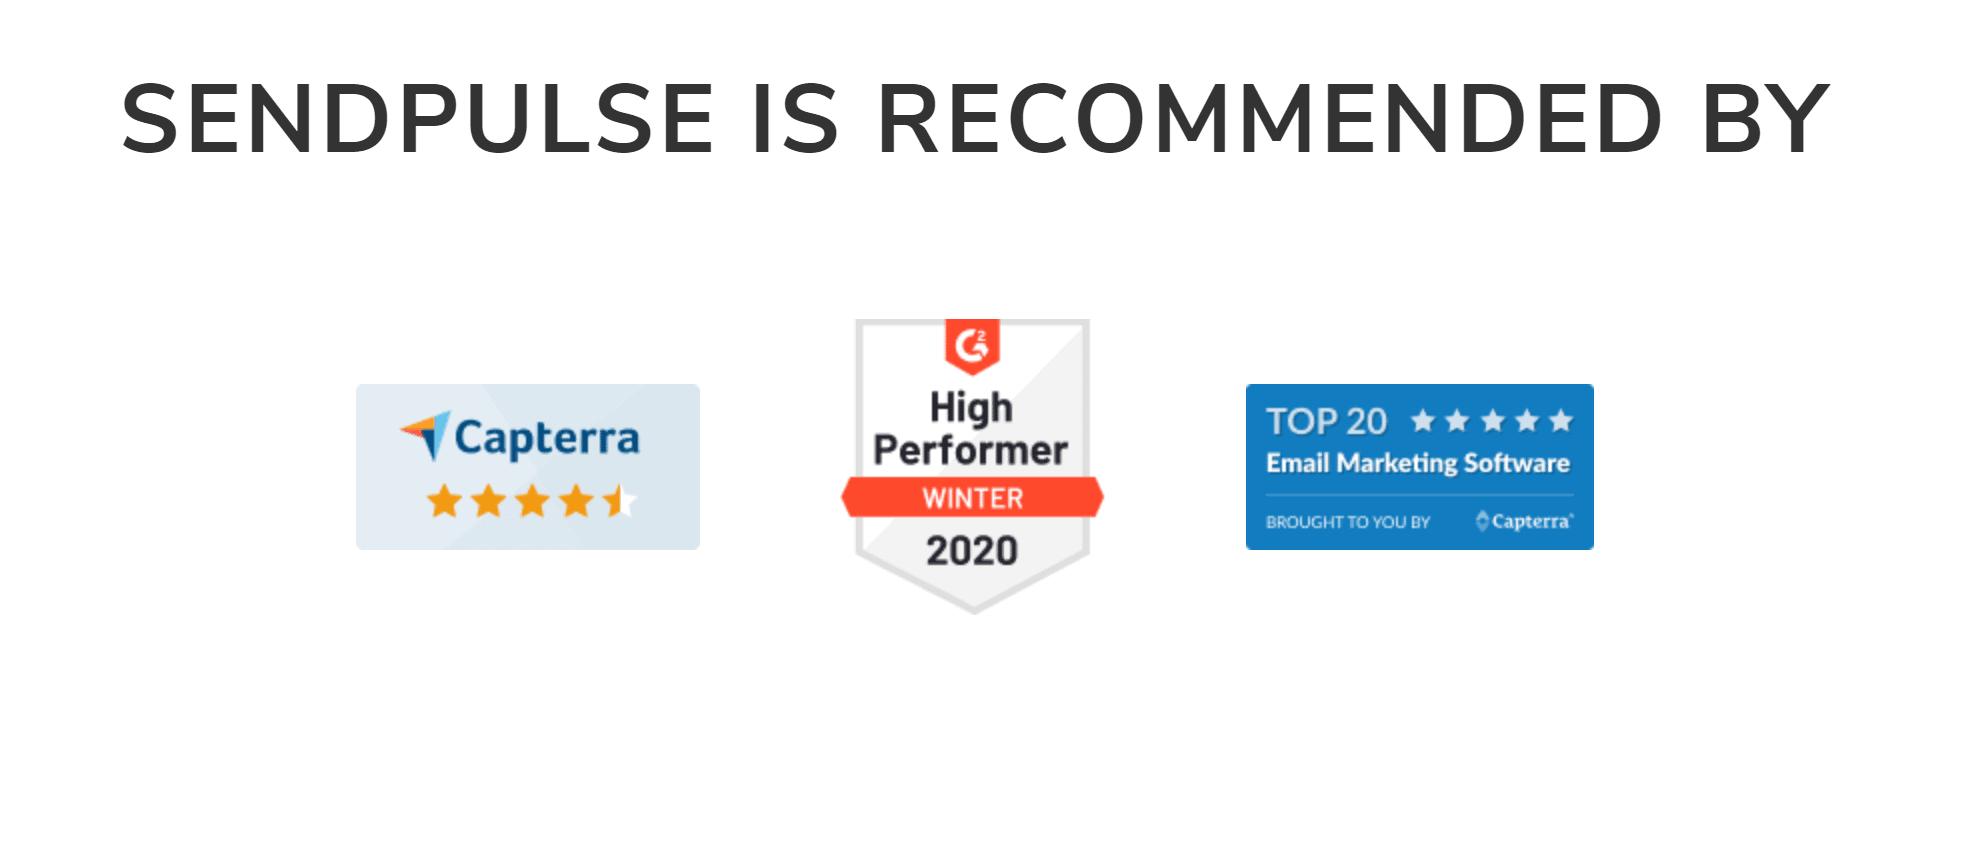 Sendpulse recommendations